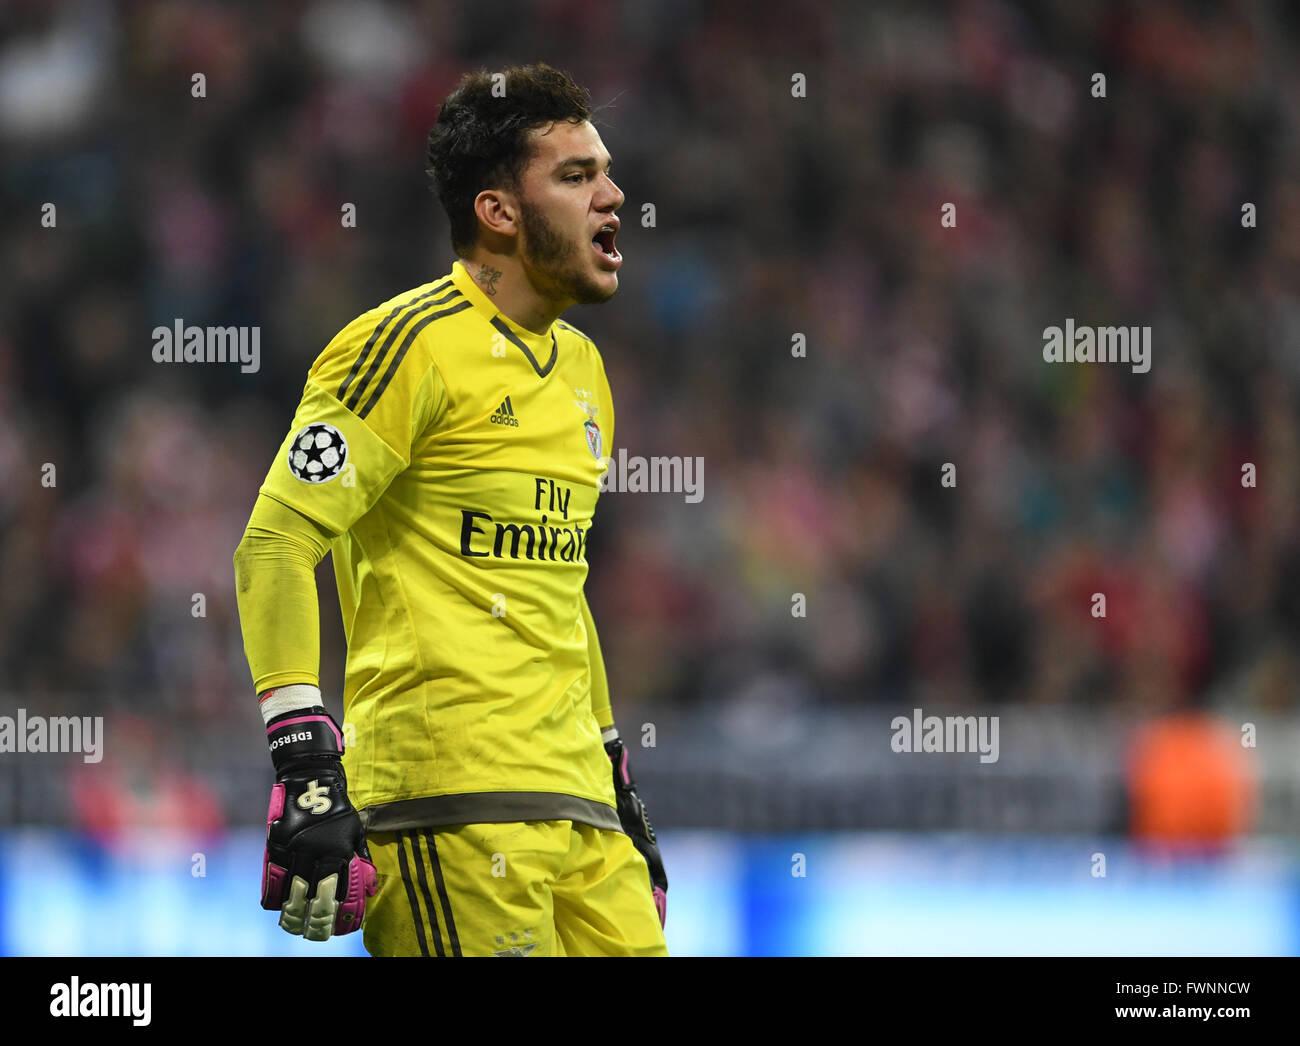 Munich Germany 5th Apr 2016 Benfica s goalkeeper Ederson